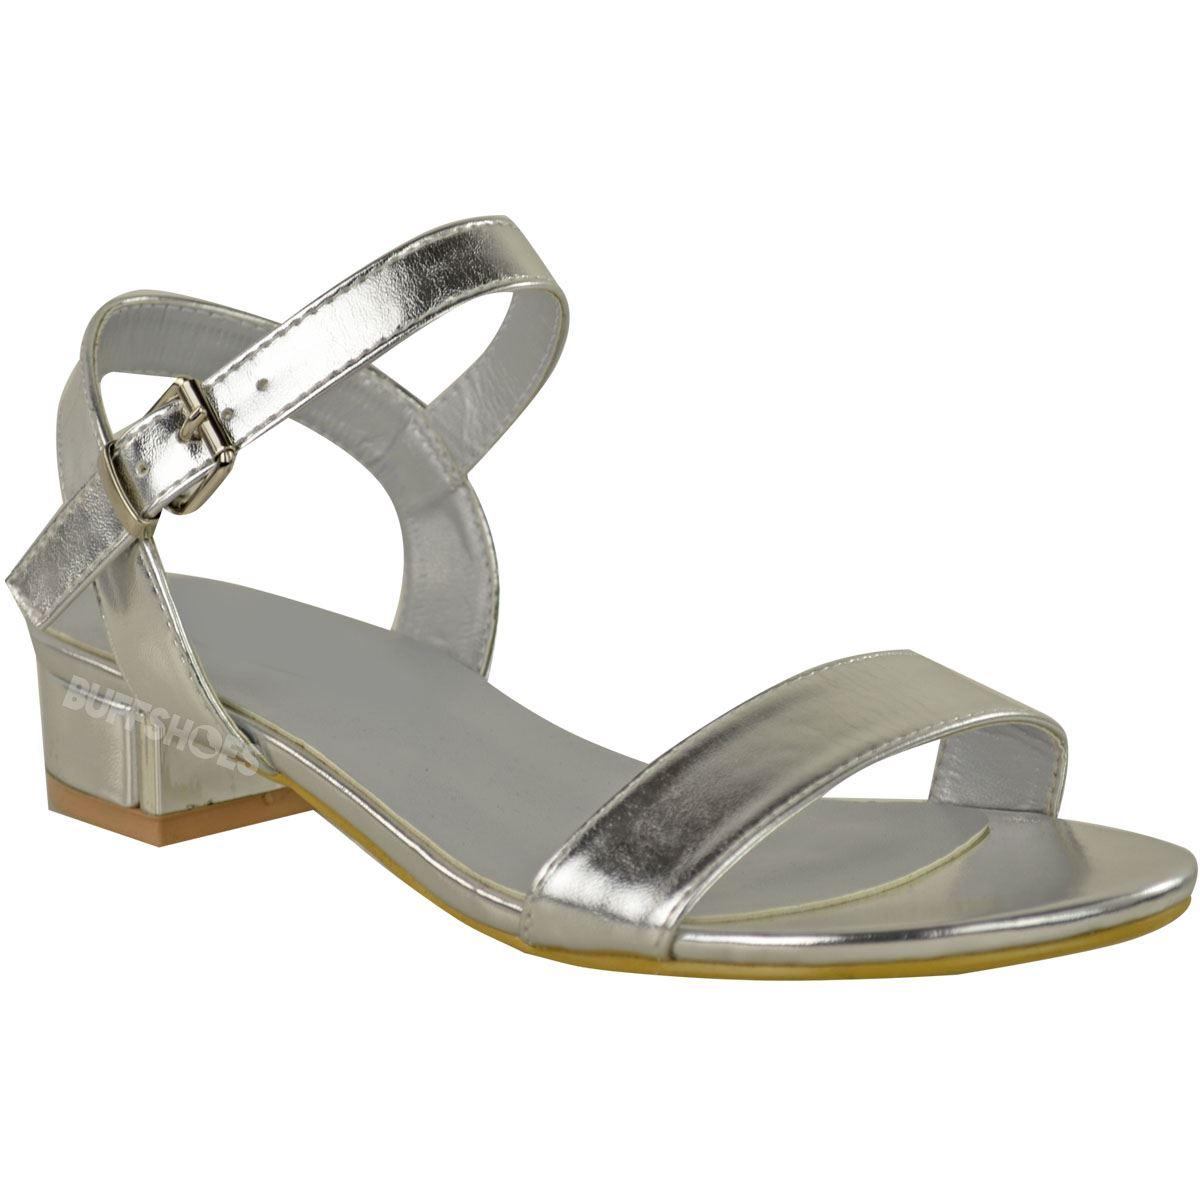 Womens Ladies Strappy Sandals Flat Low Block Heel Summer